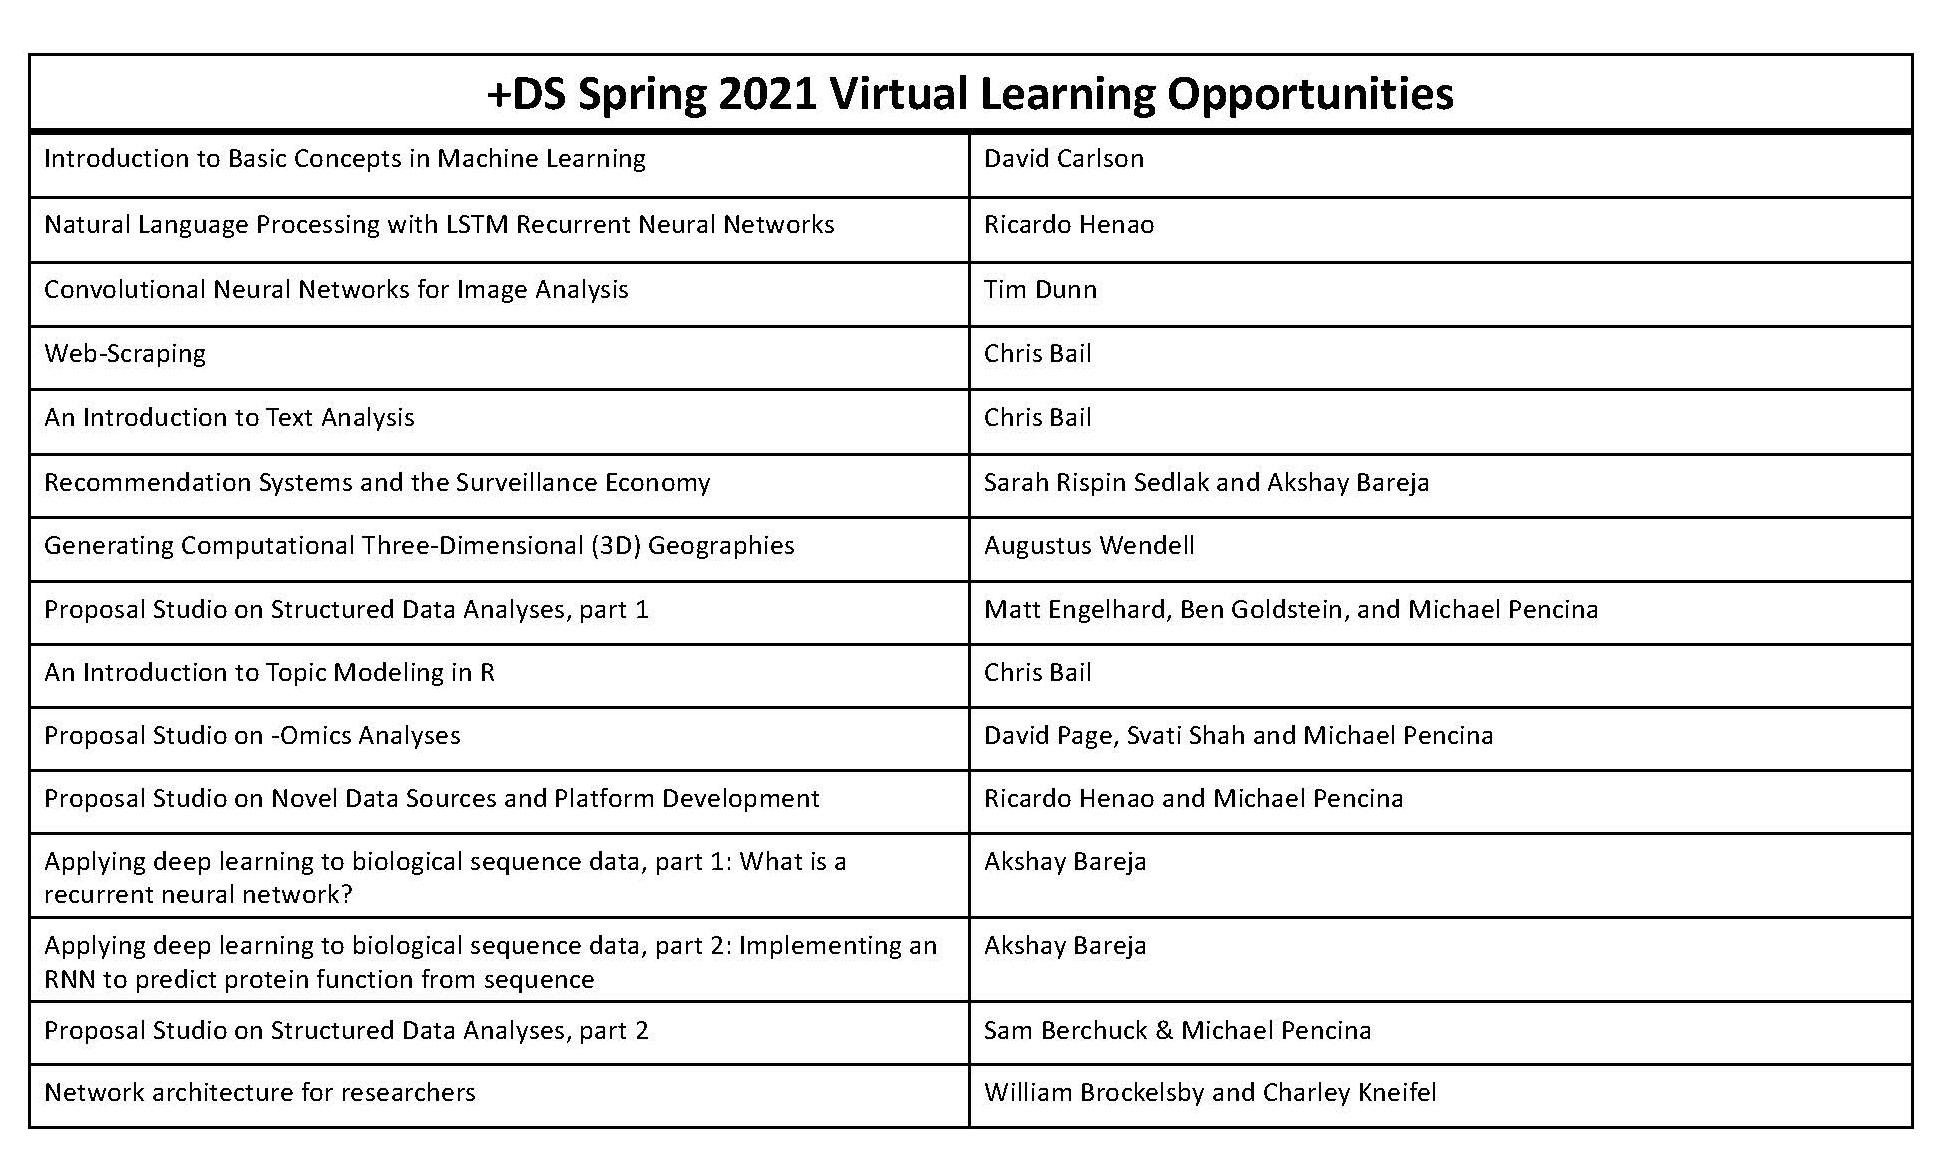 +DS Spring vLE's